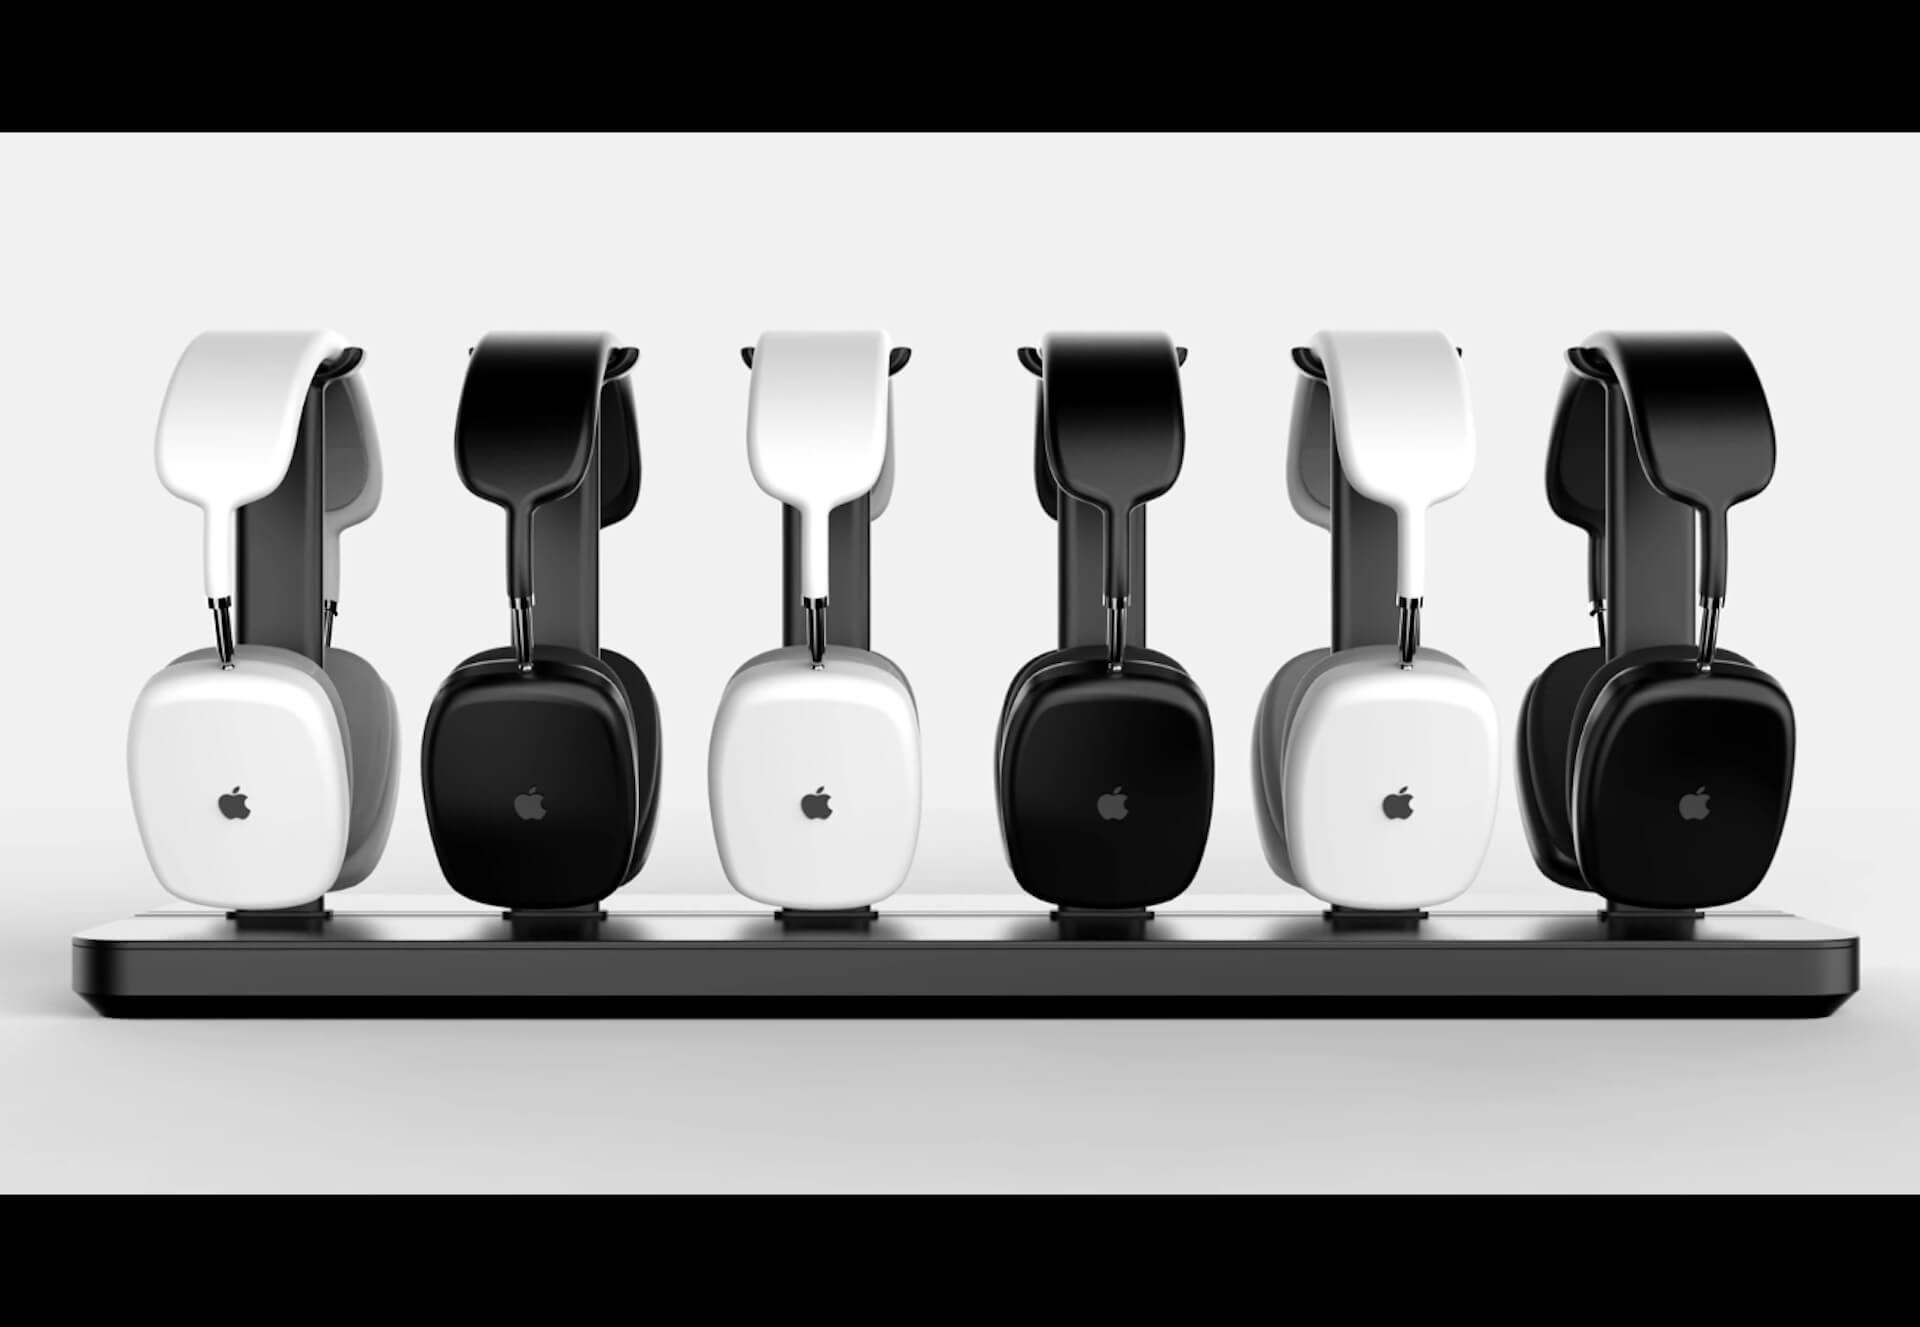 iOS 14.3でAirPods Studioのアイコンが発見される 来年3月発表の布石か? tech201113_airpodsstudio_main